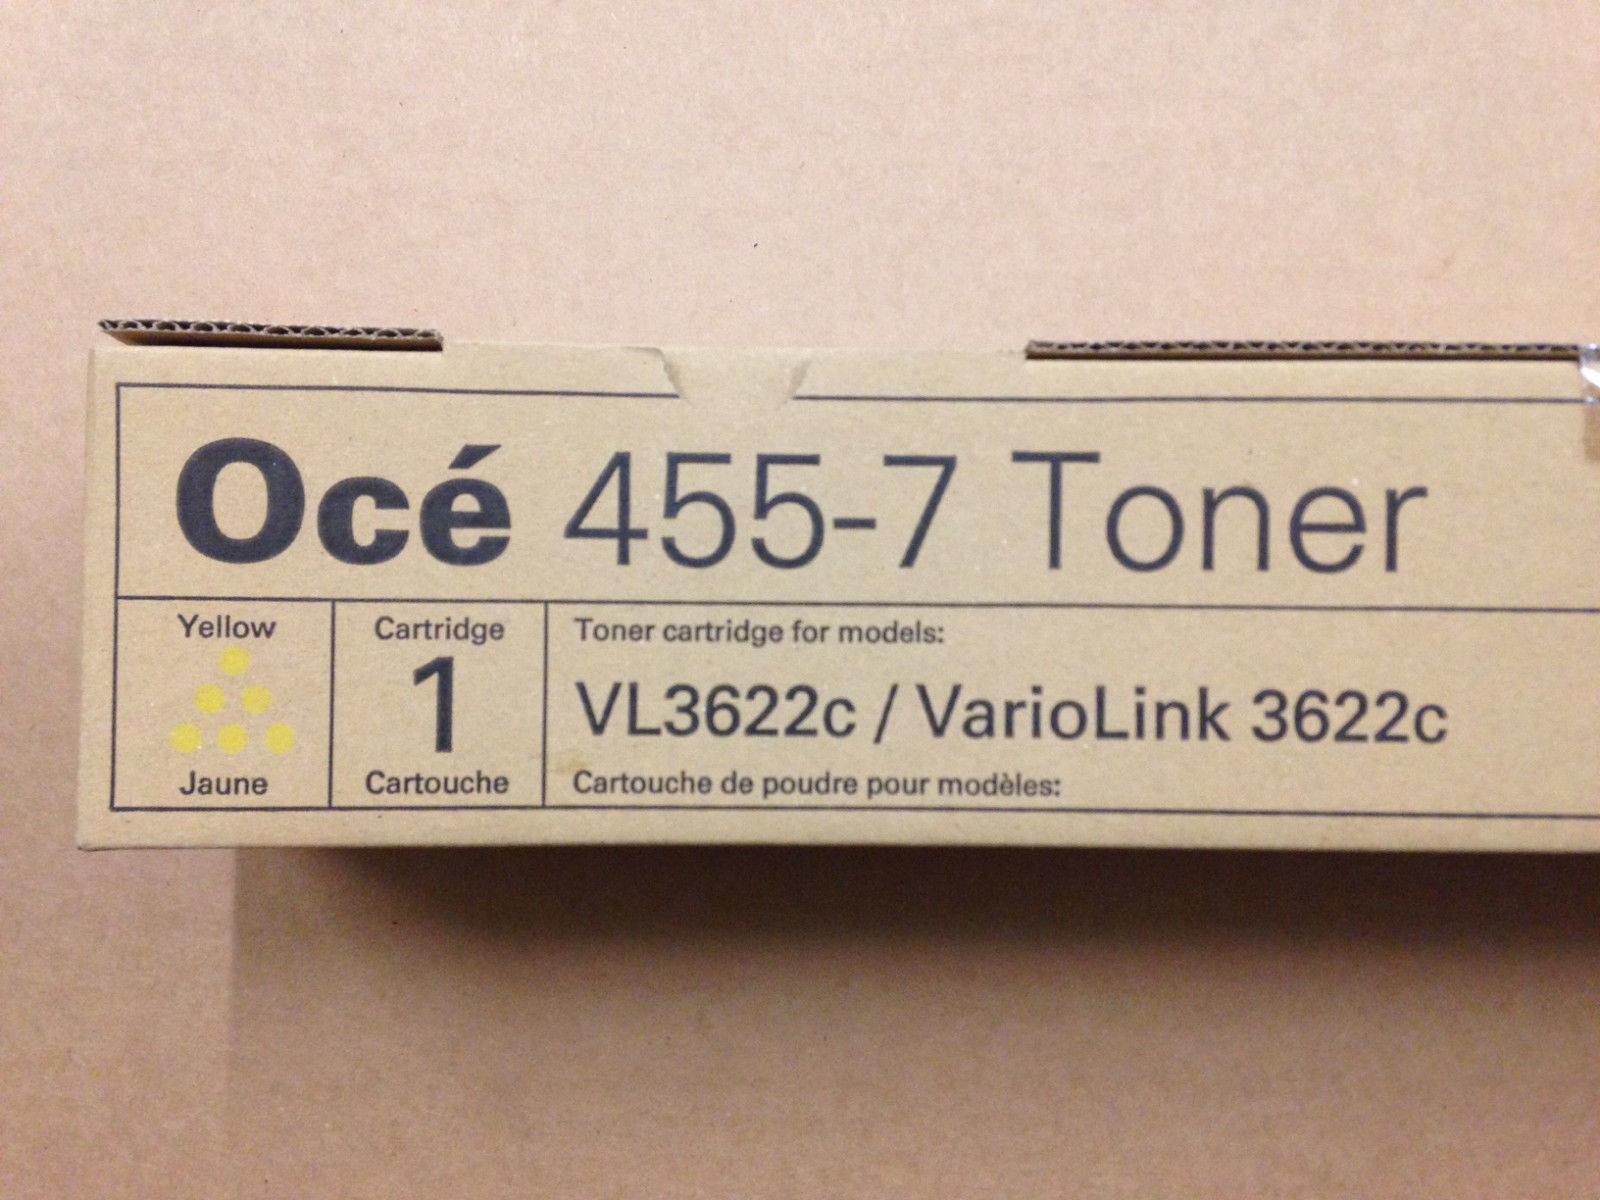 Genuine Oce 455-7 Yellow Toner for VarioLink 3622c - Same Day Shipping